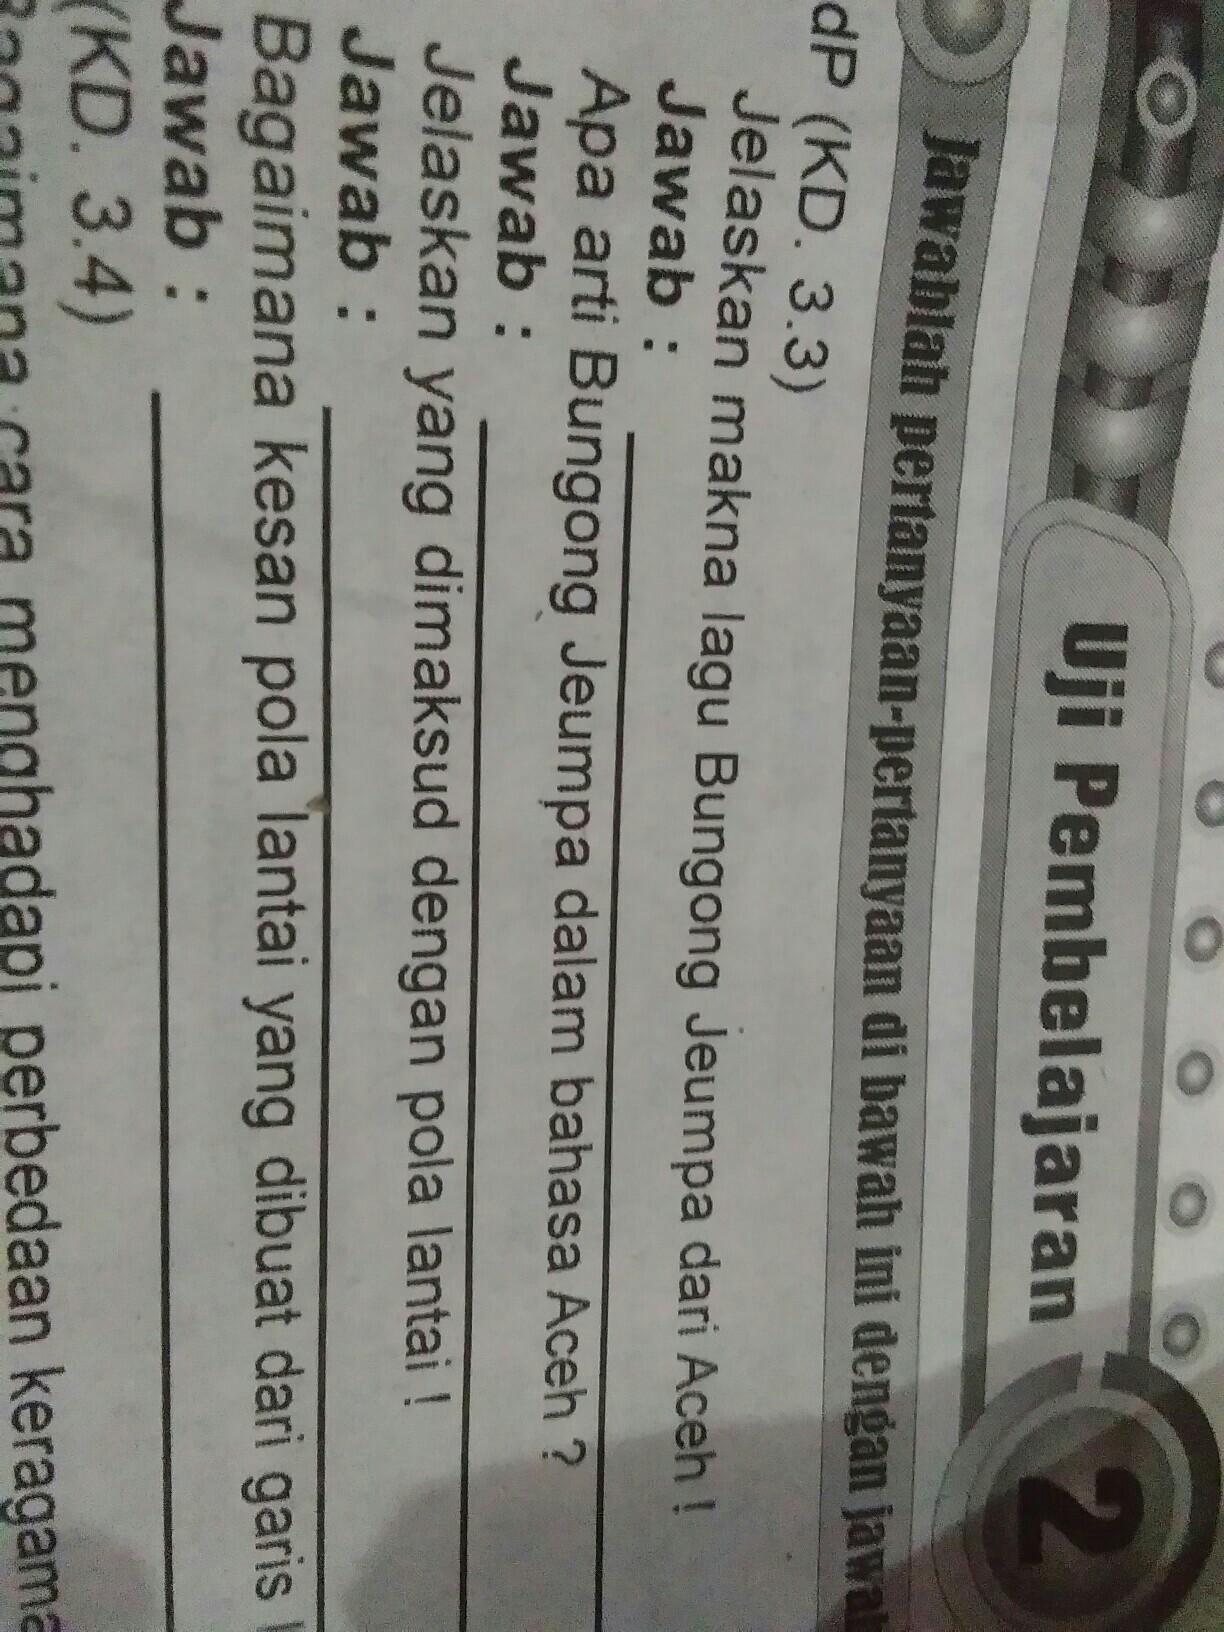 Apa Arti Bungong Jeumpa Dalam Bahasa Aceh No 2 Brainly Co Id